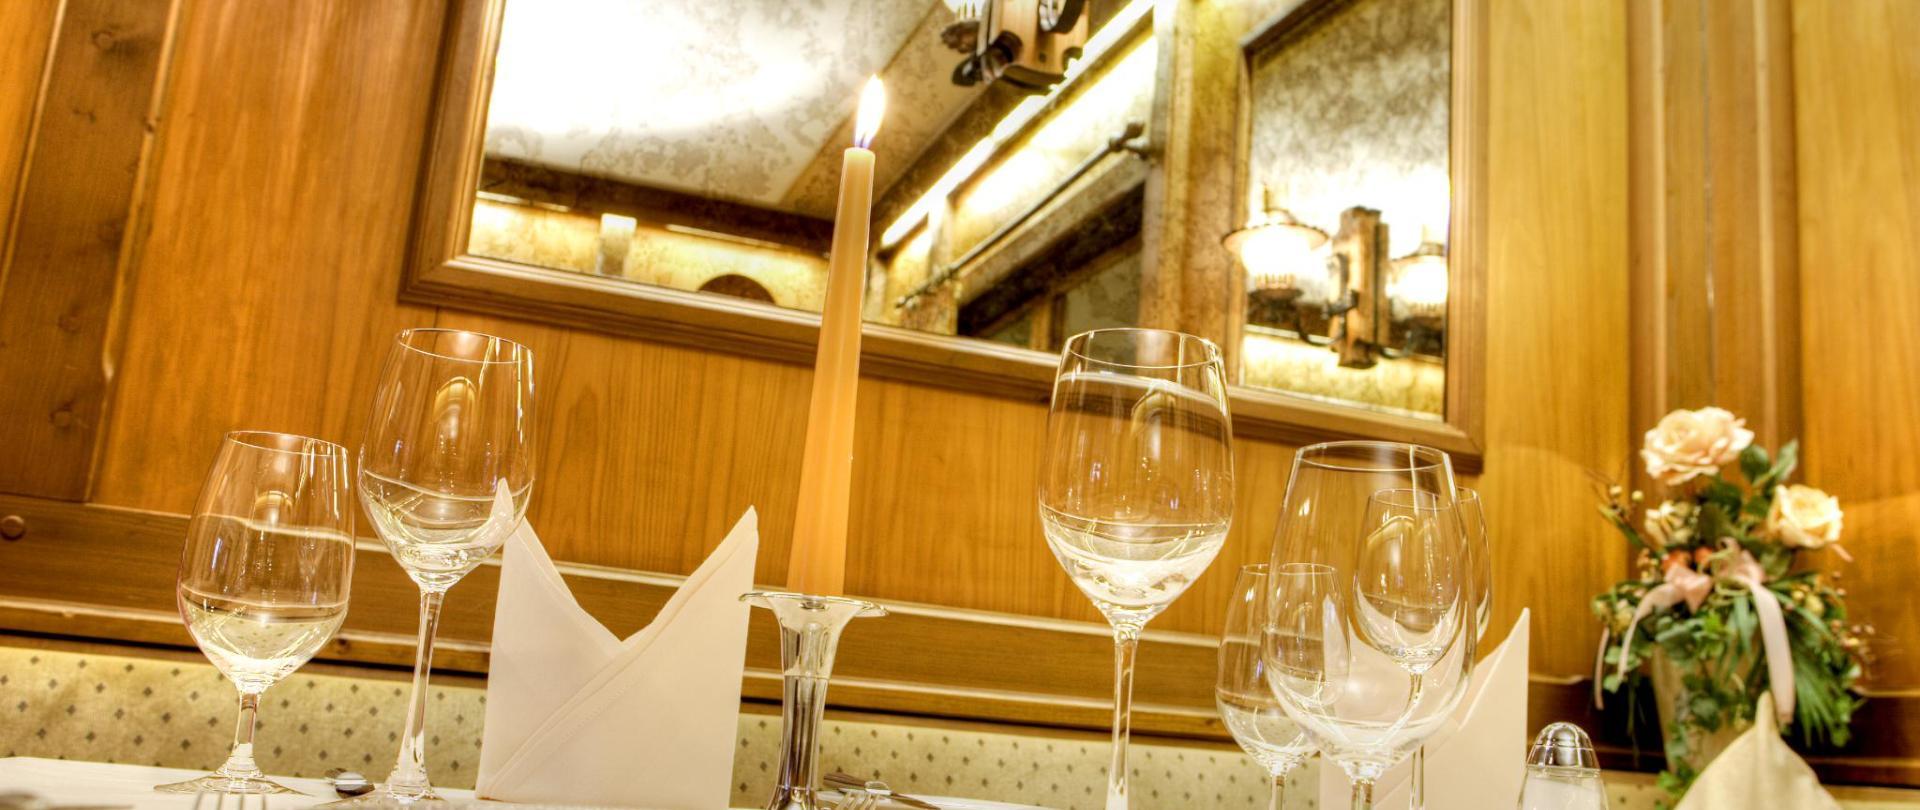 Bilder Hotel 006.jpg